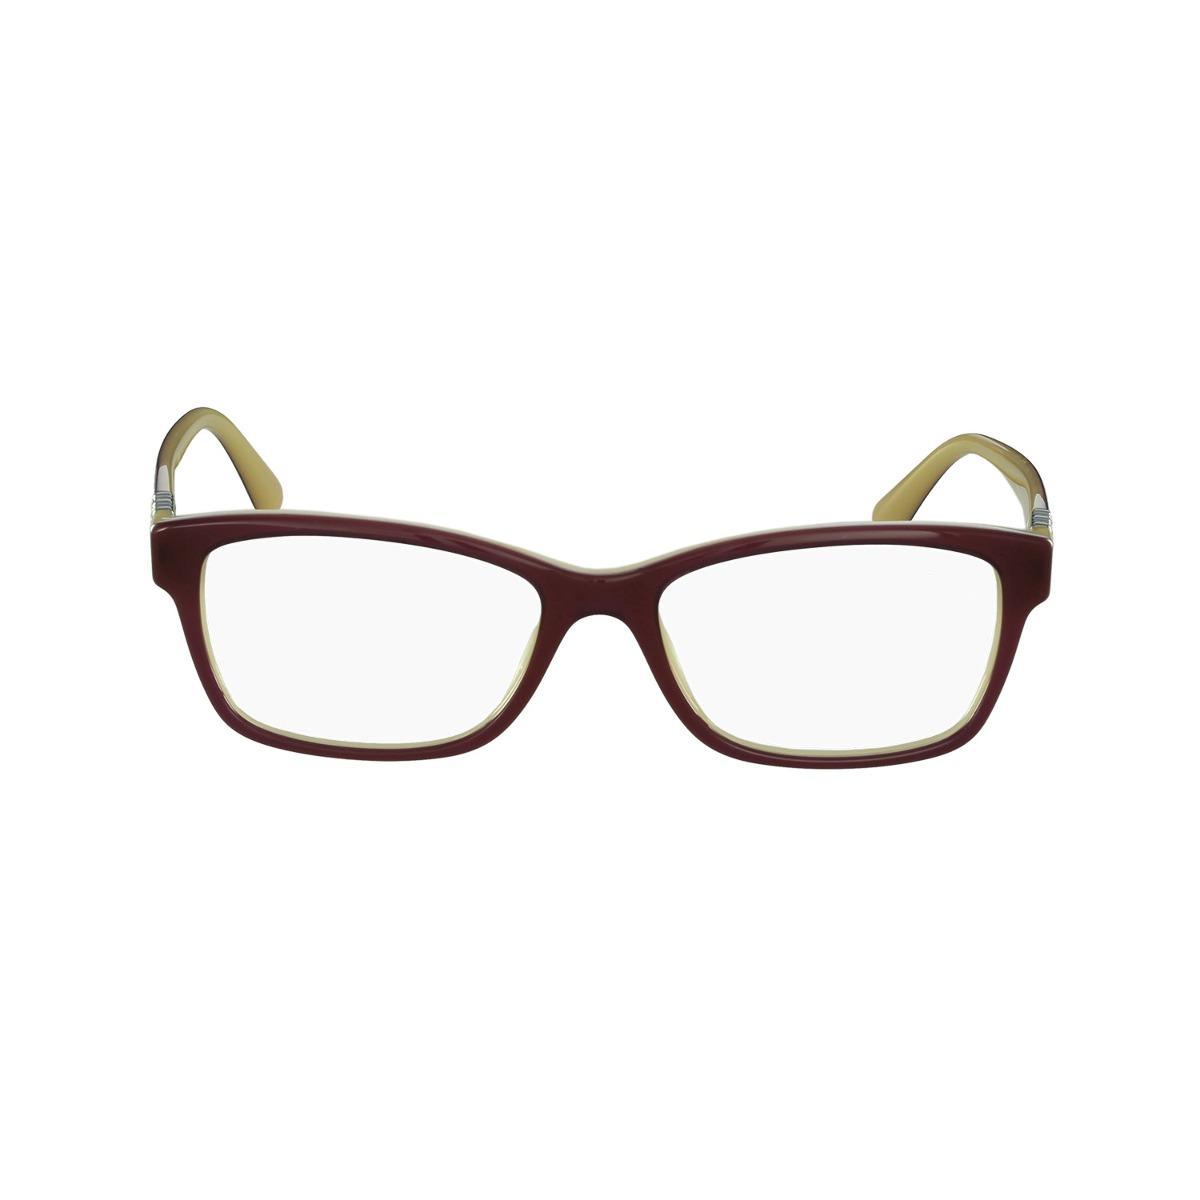 624c632438172 óculos de grau vogue casual roxo. Carregando zoom.